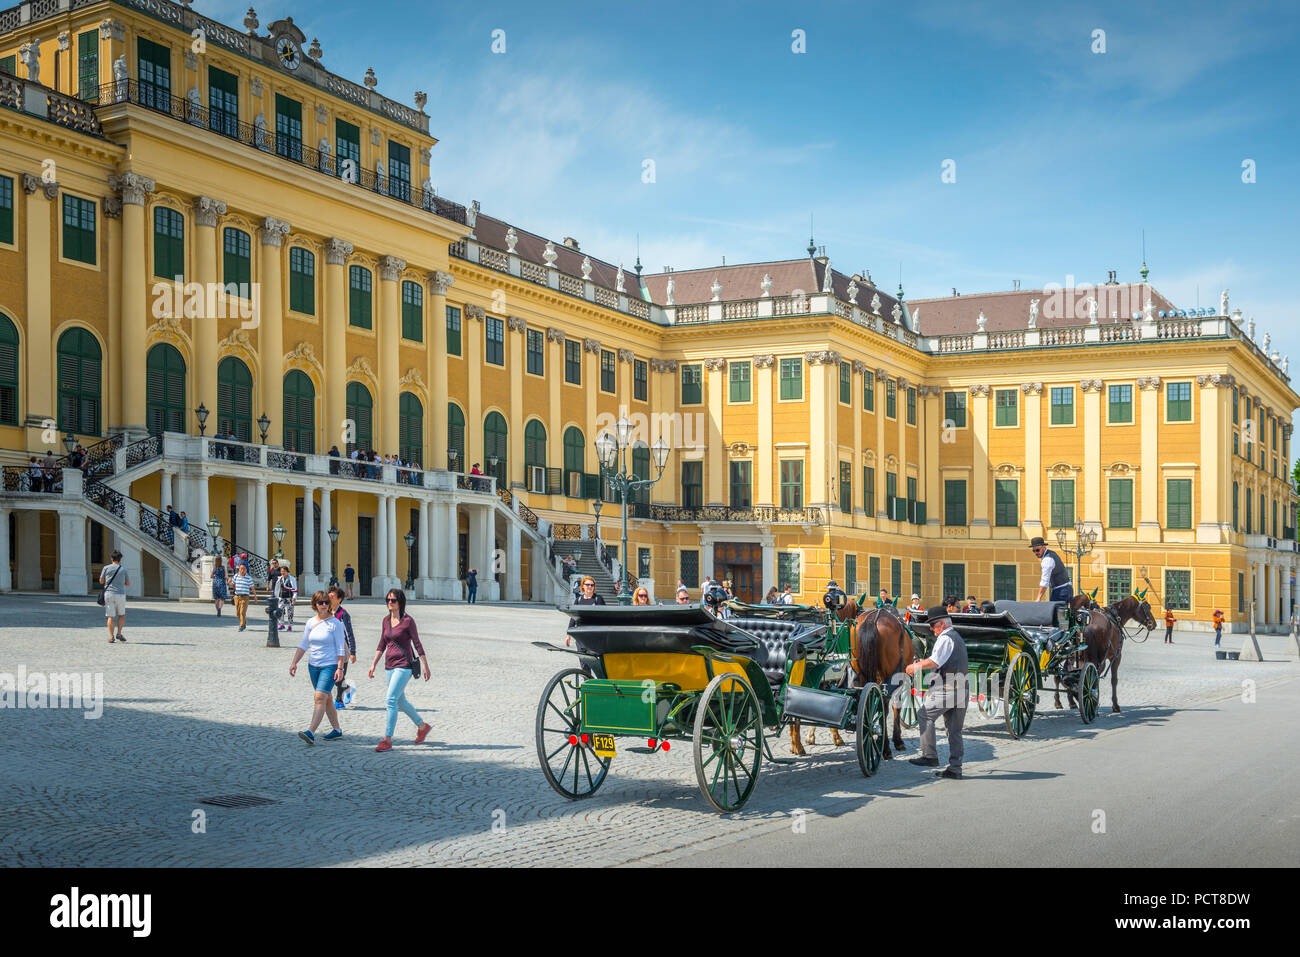 Europa, Österreich, Wien, Schloss, Palast, das Schloss Schönbrunn, Wien, Österreich, Architektur, Kapital Stockbild